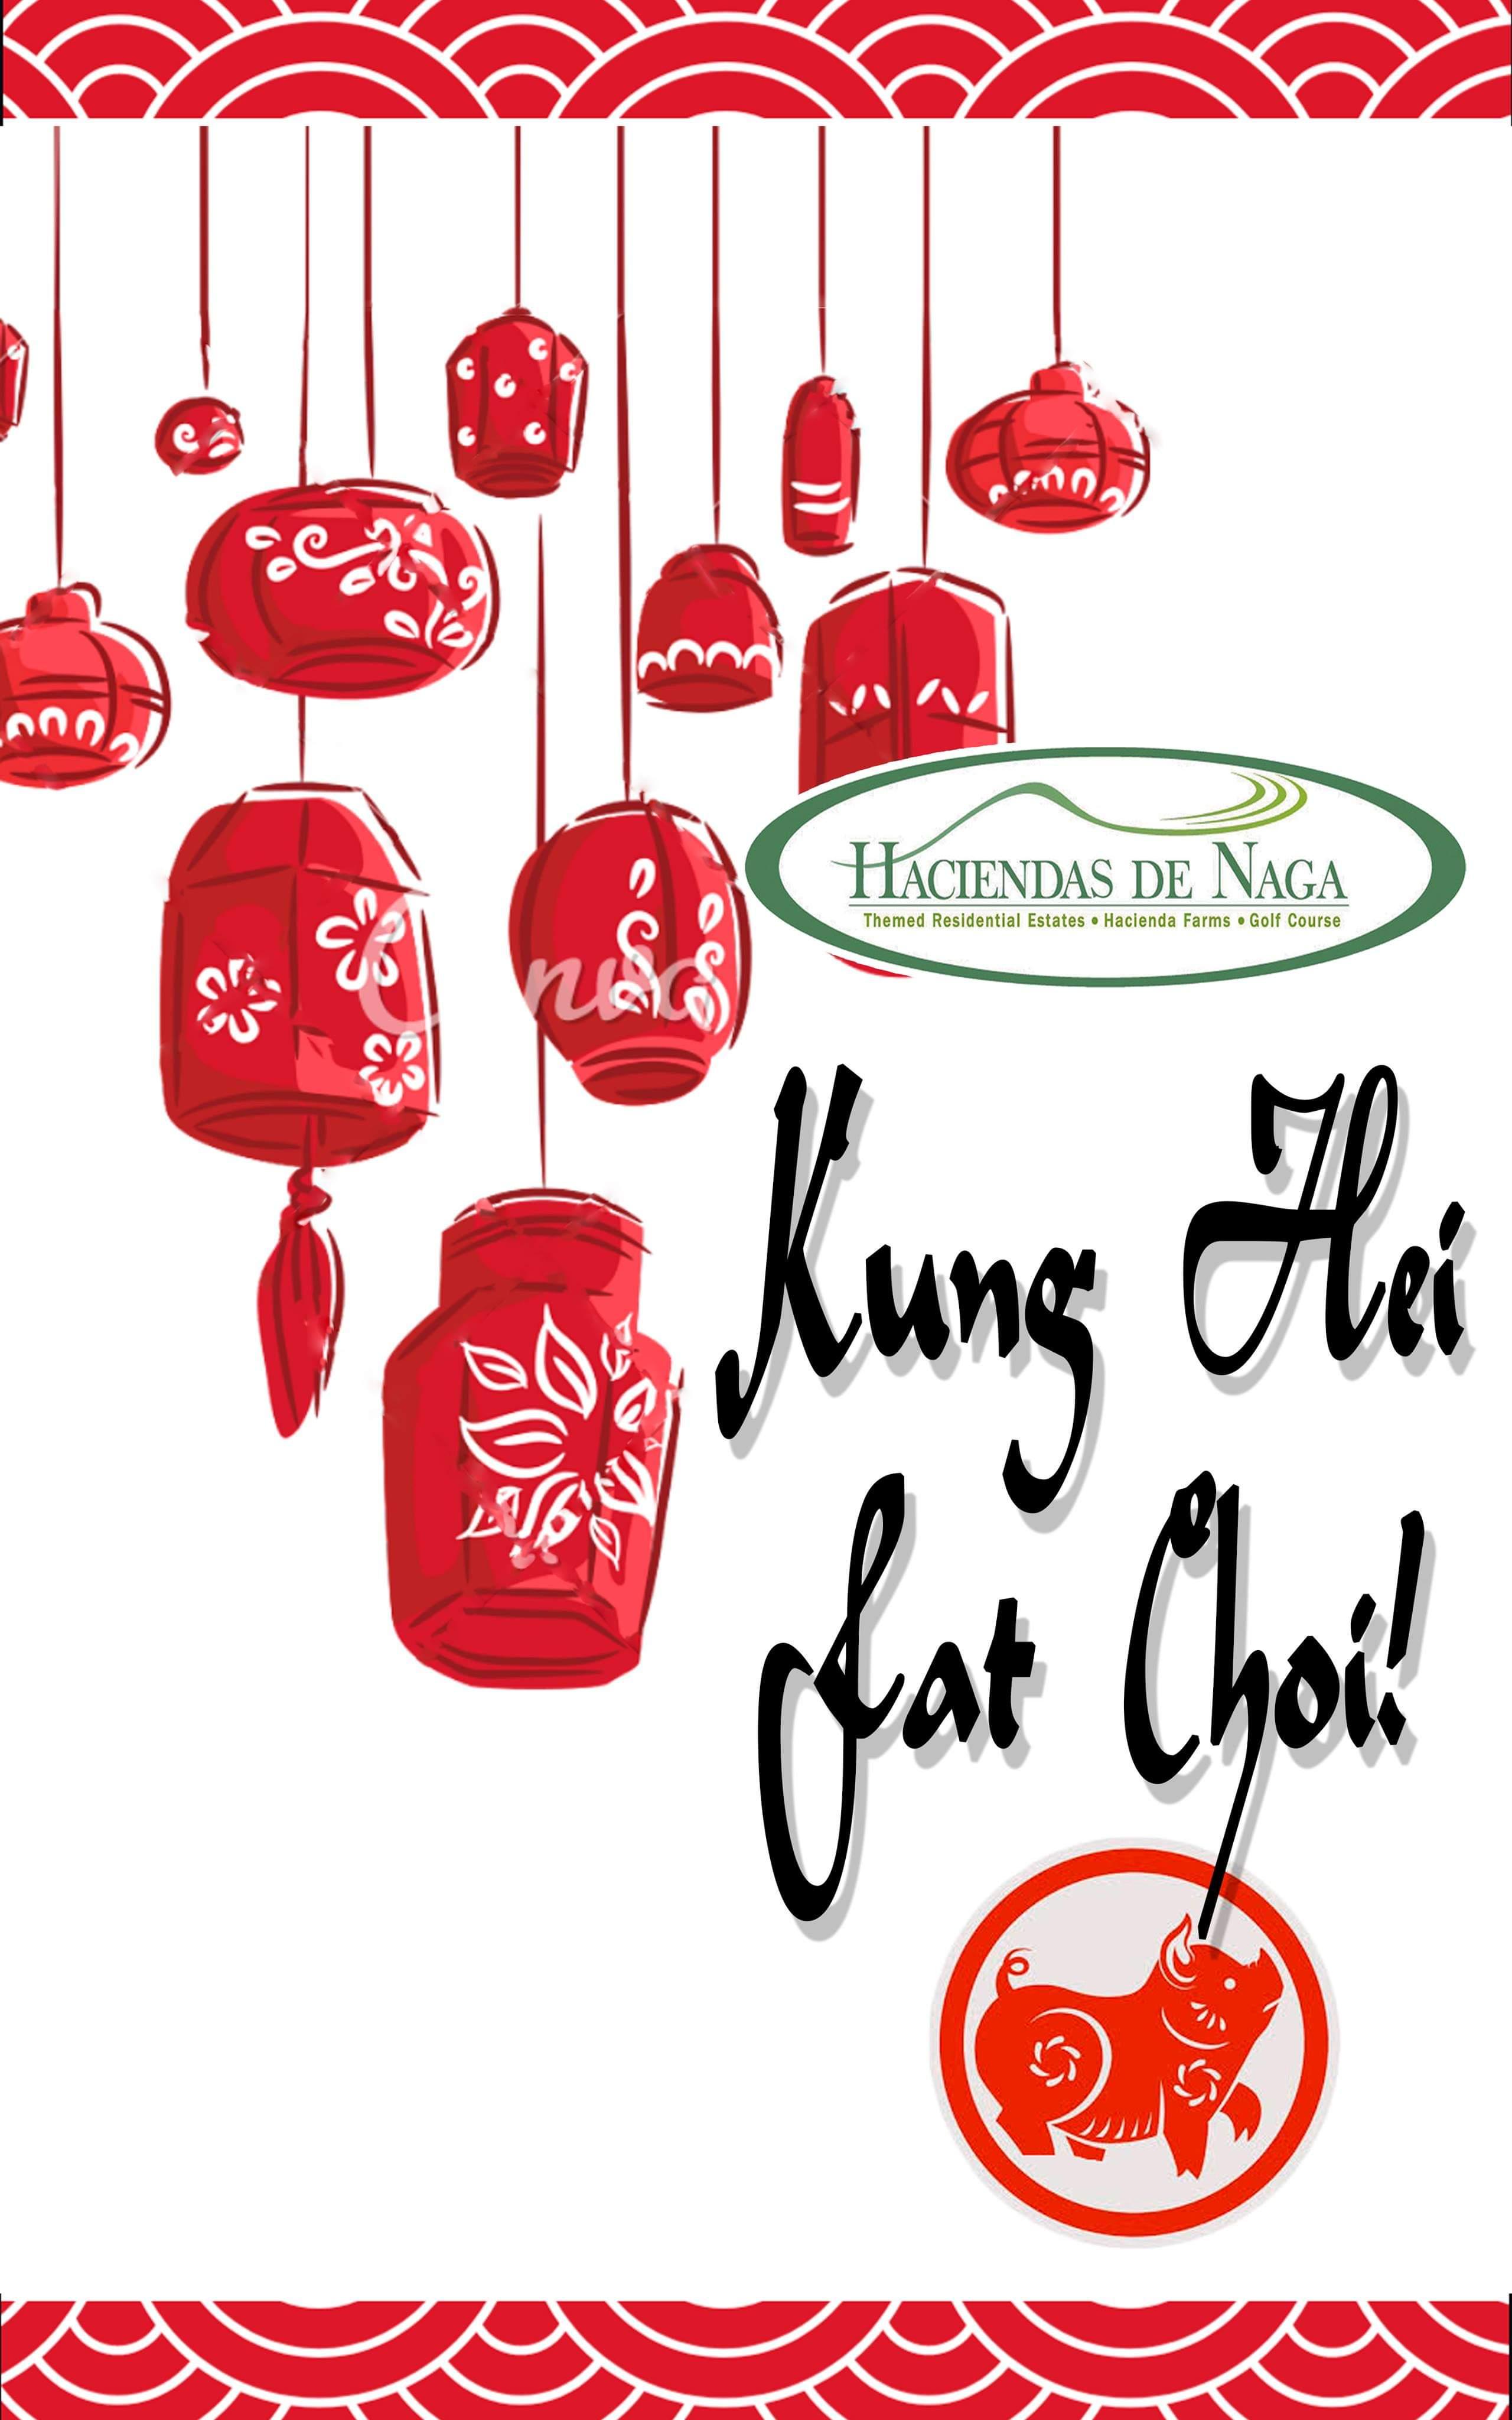 Chinese New Year greeting from Haciendas De Naga